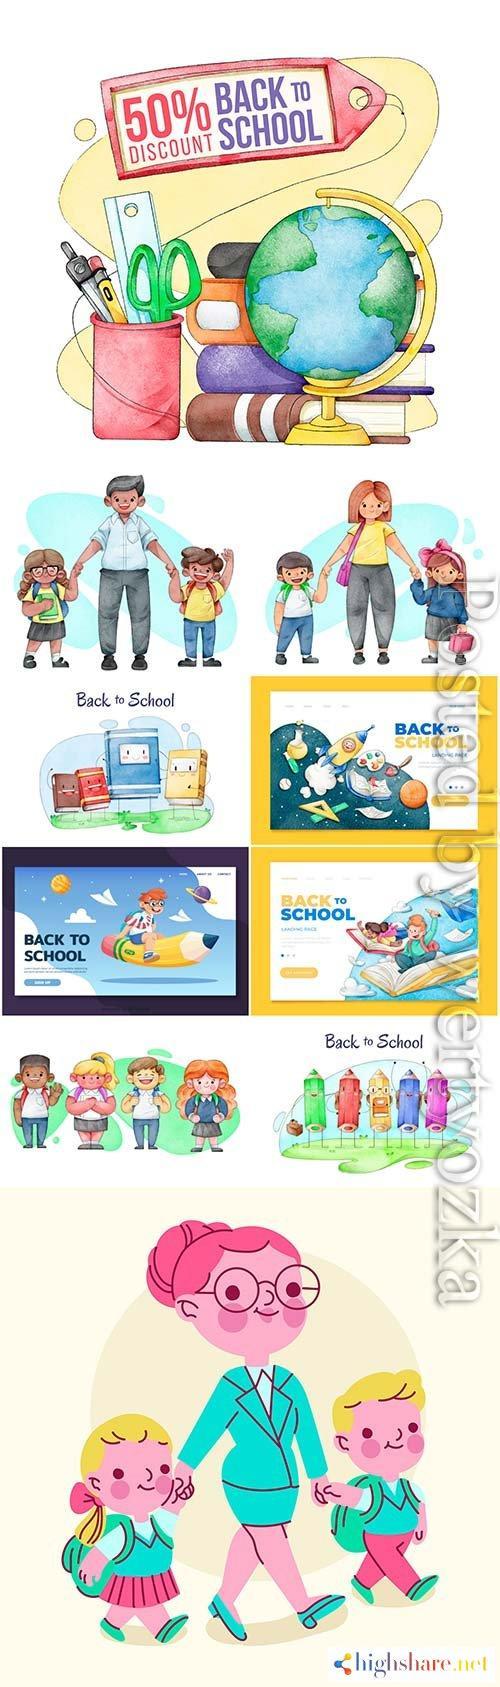 watercolor back to school vector template design 5f3fffd5f417d - Watercolor back to school vector template design